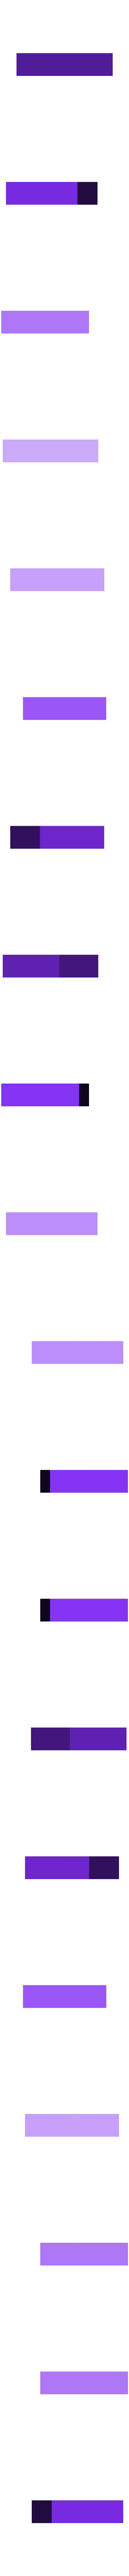 Caja_50mm.stl Descargar archivo STL Lámpara ciervo • Plan de la impresora 3D, filaprim3d